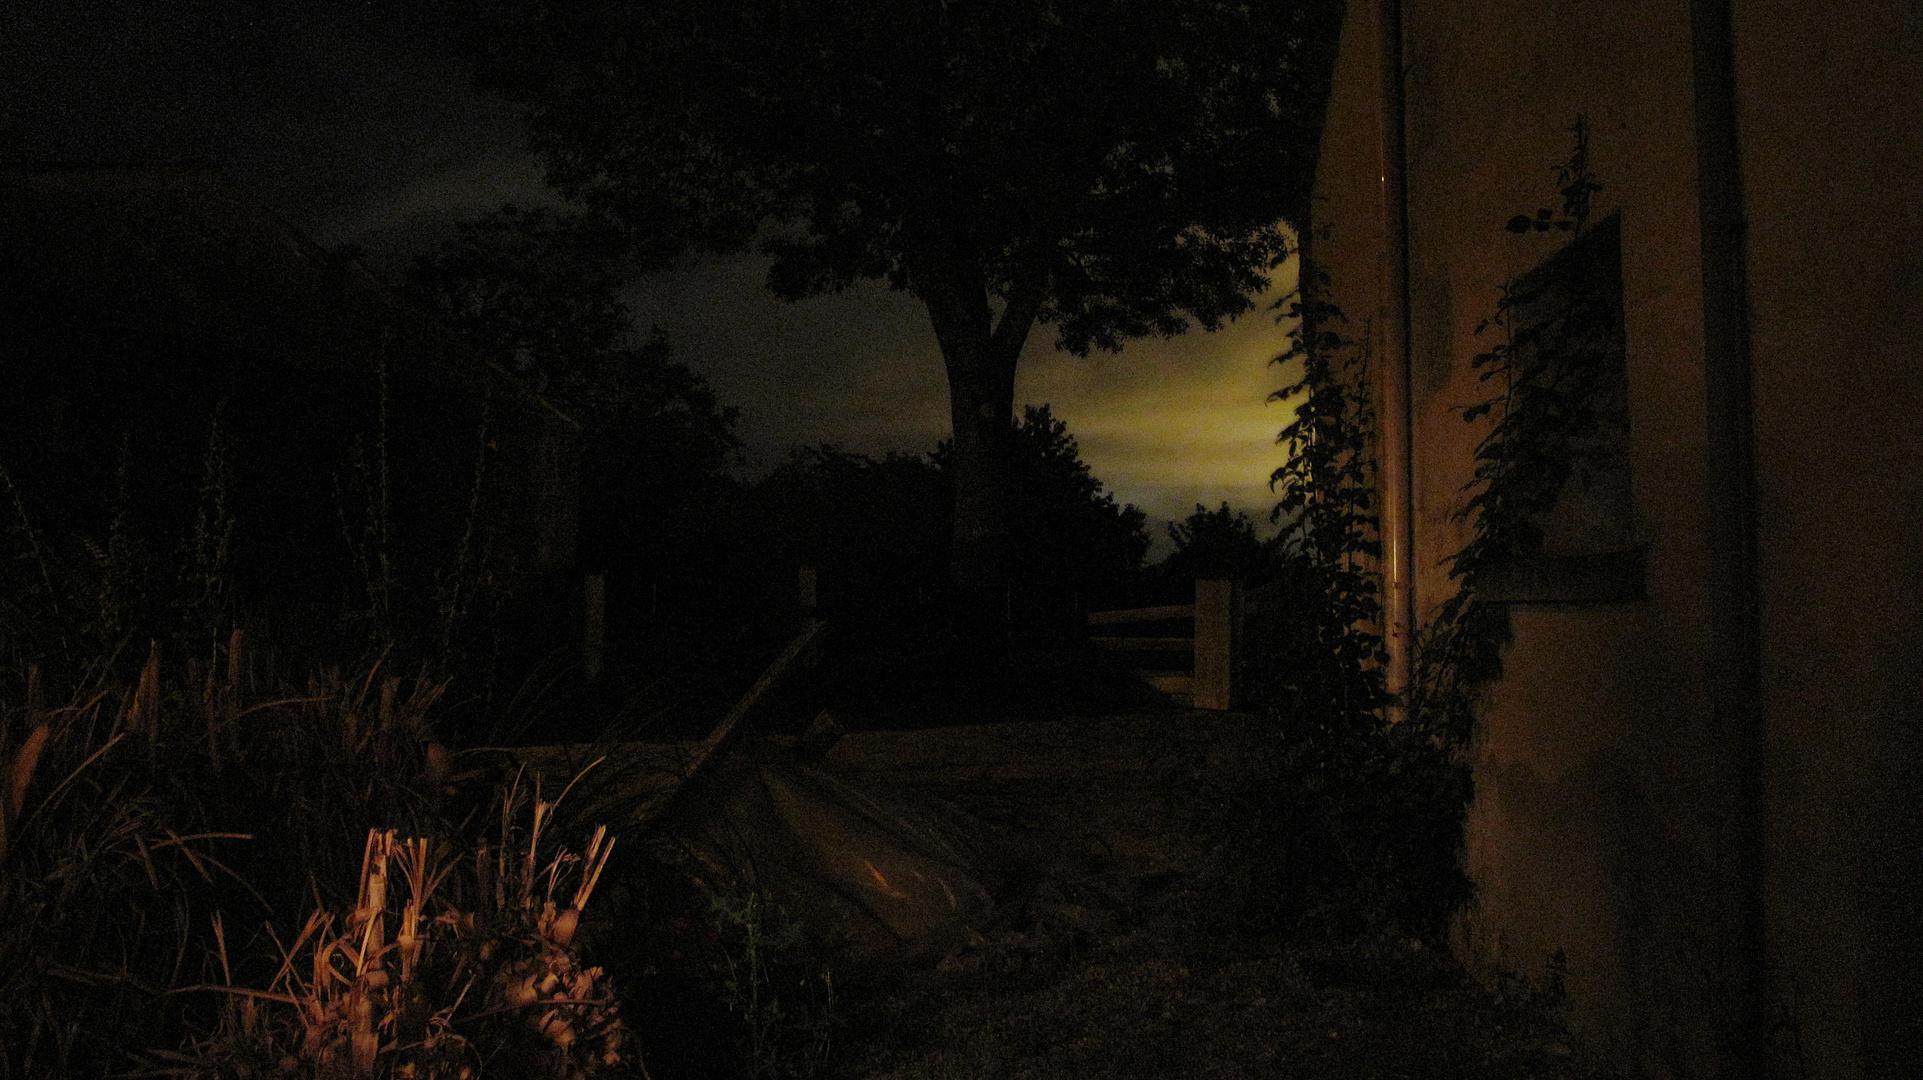 Into the backyard, at night.